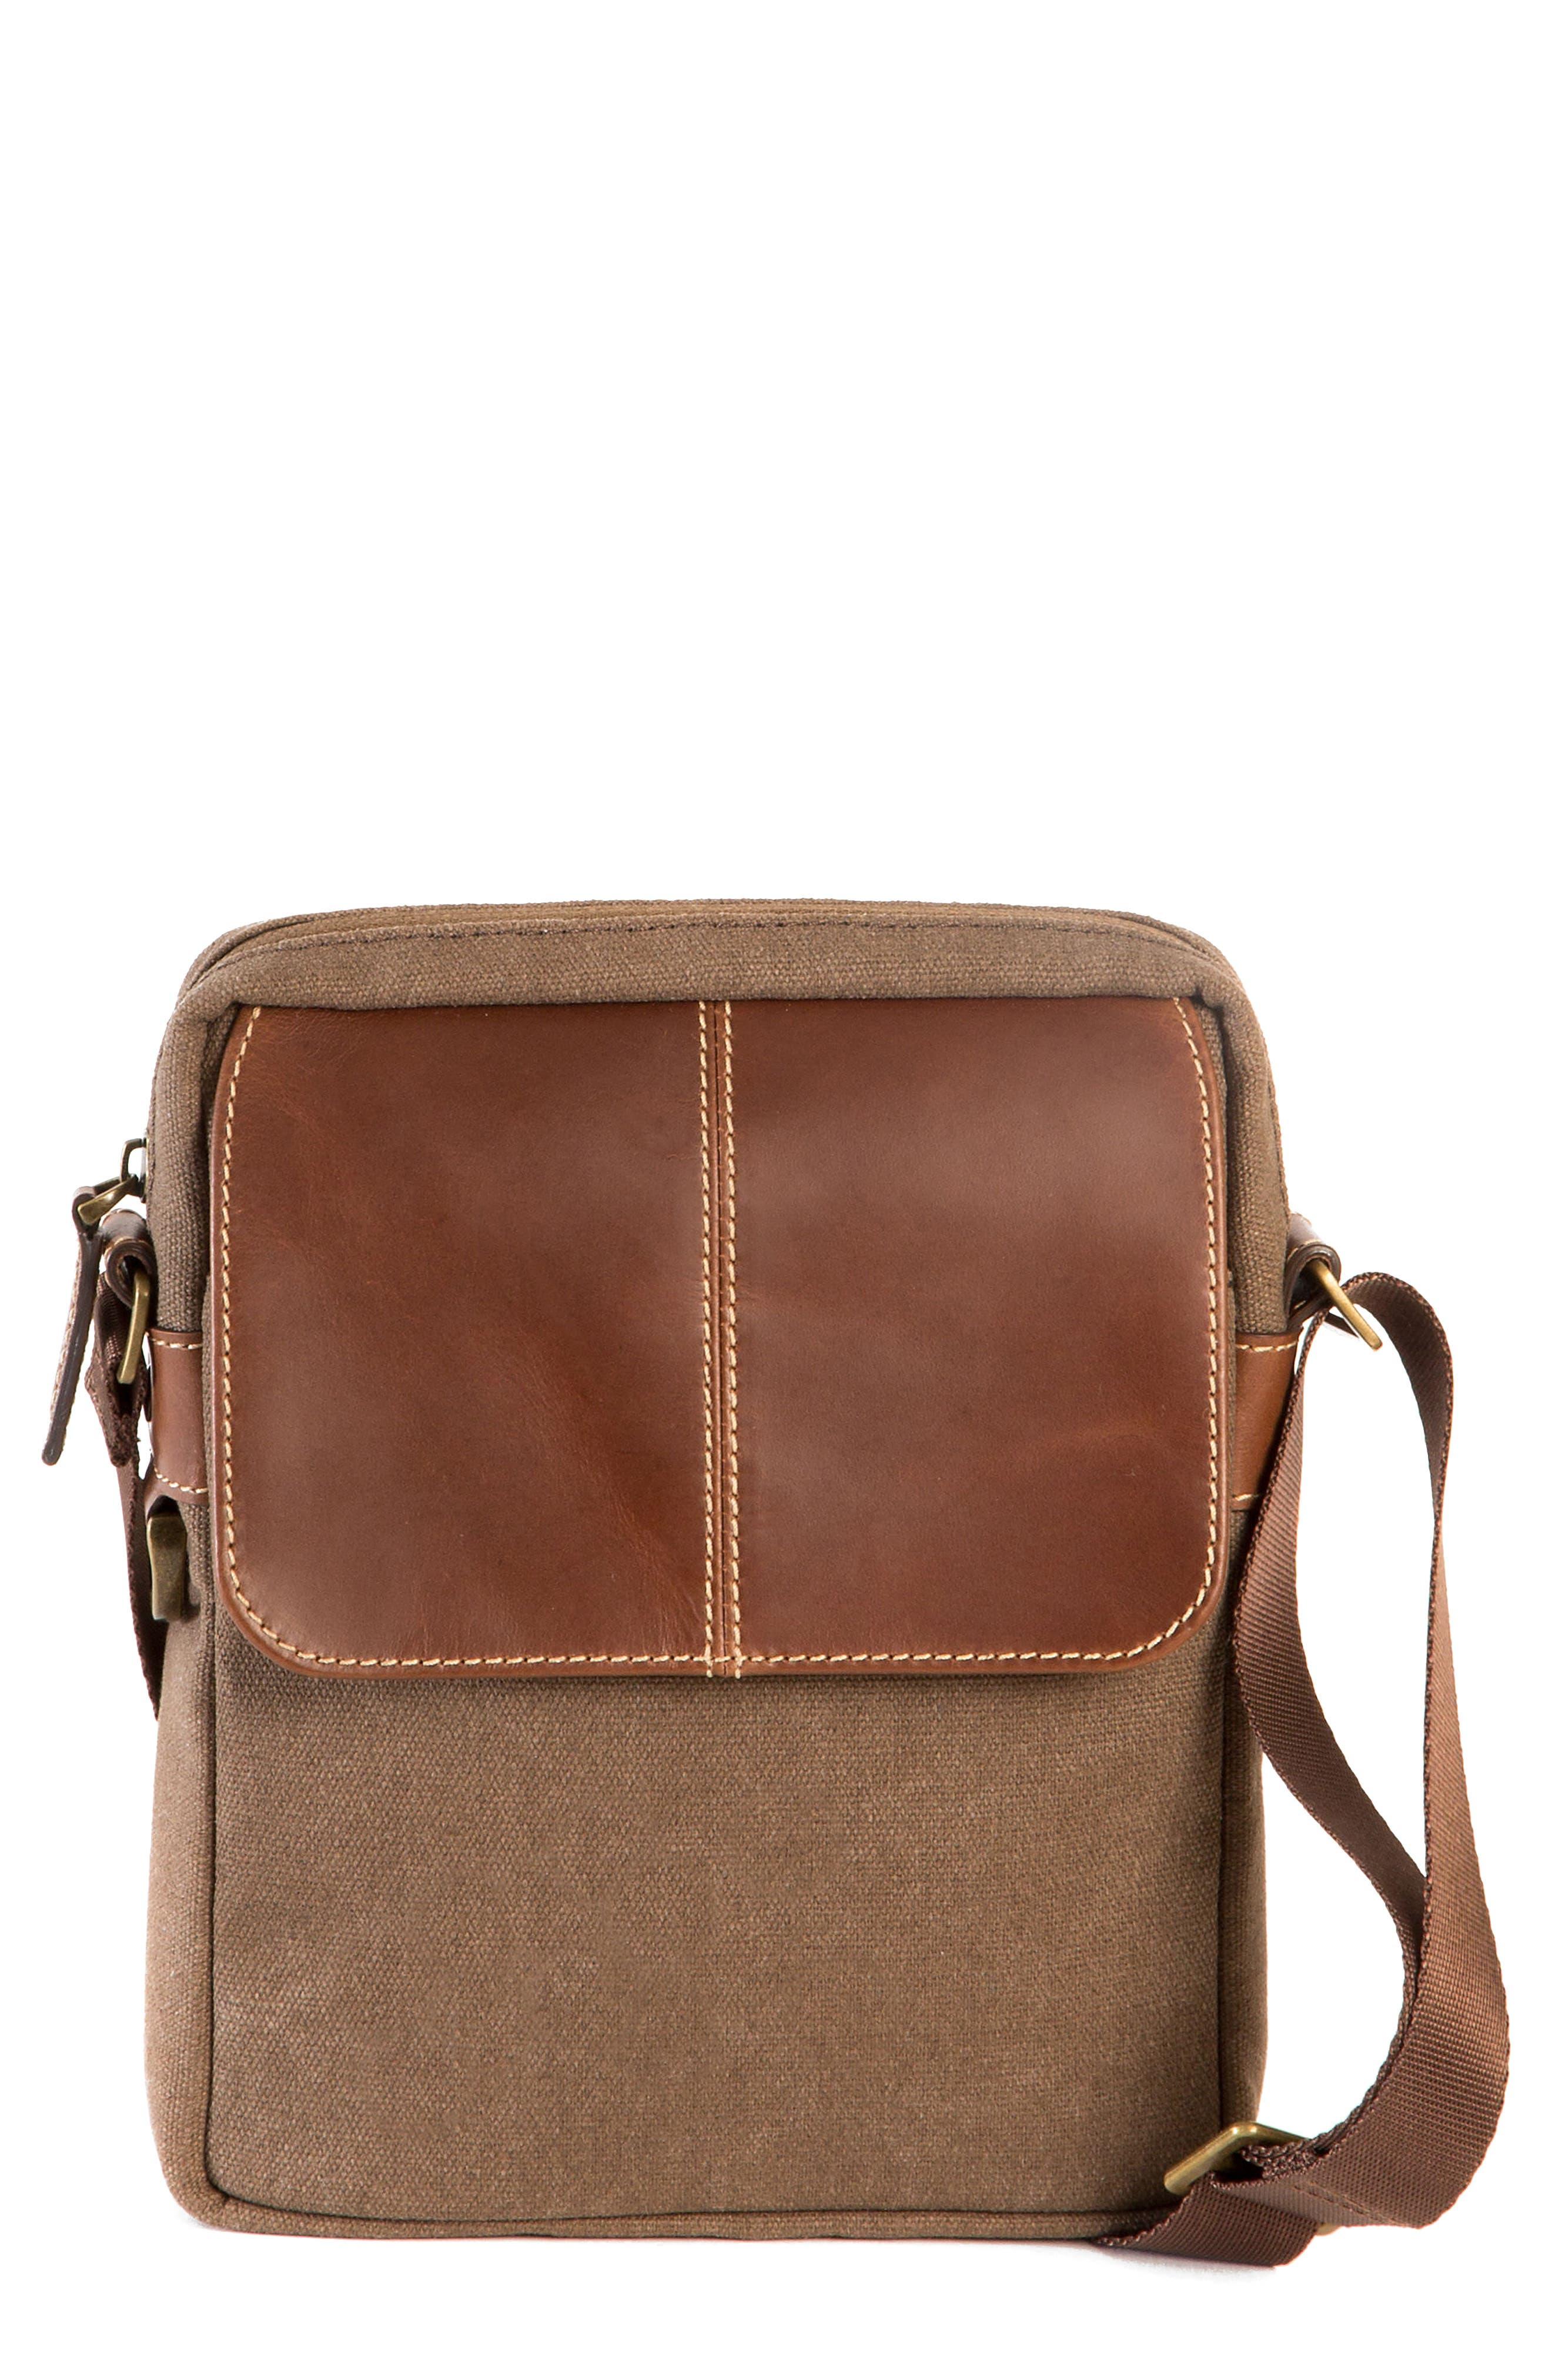 Bryant Crossbody Bag,                         Main,                         color, MAHOGANY AND HEATHER